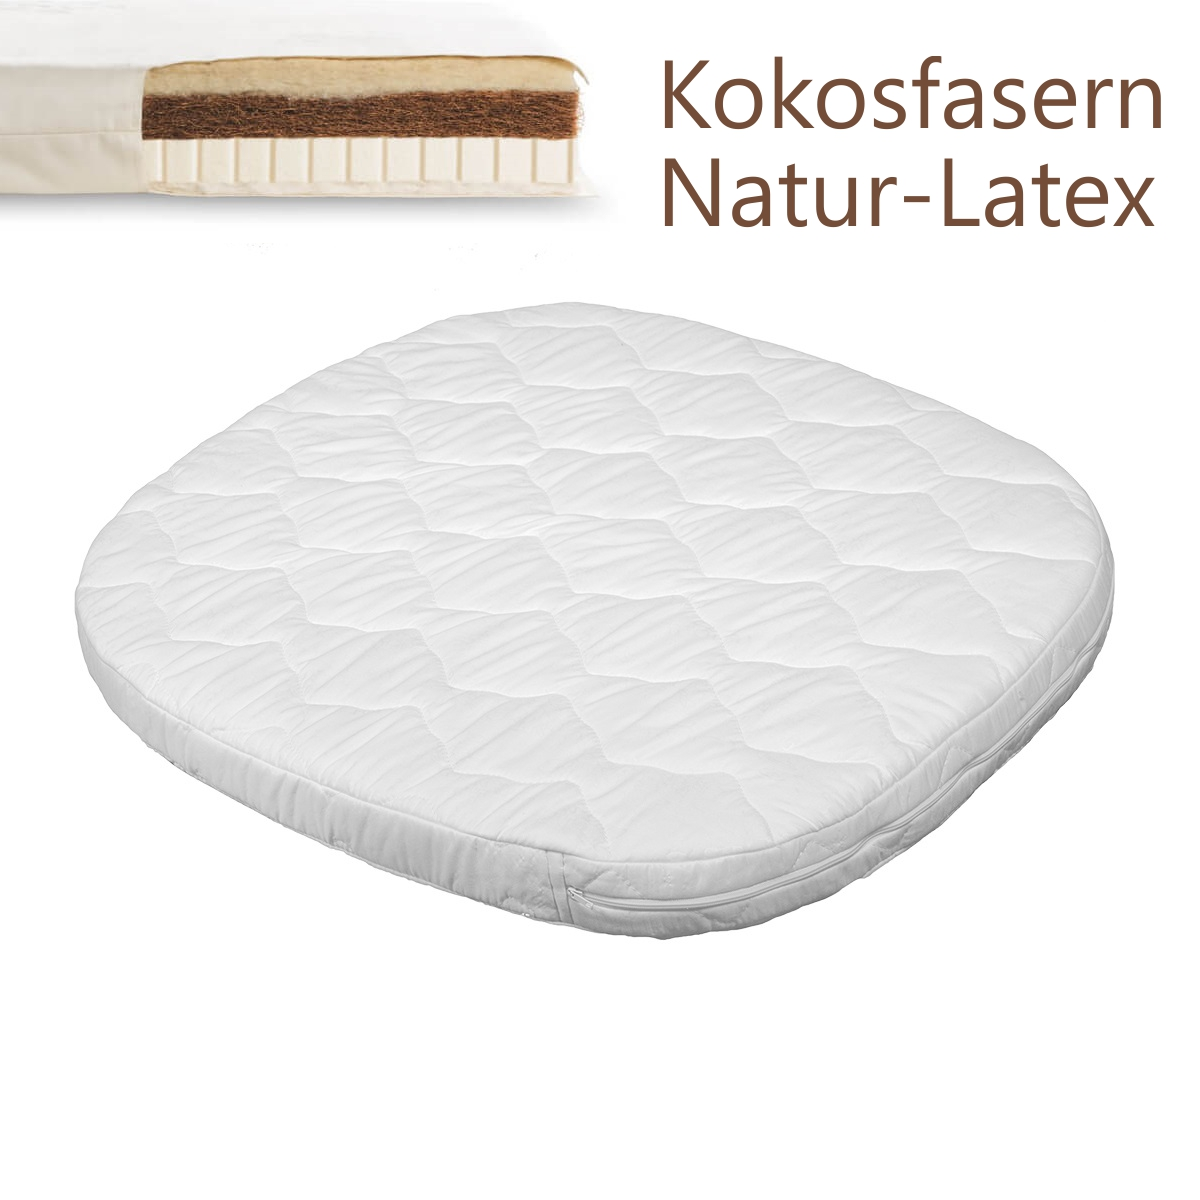 tweeto Wende-Matratze Kokos / Naturlatex - 70x70